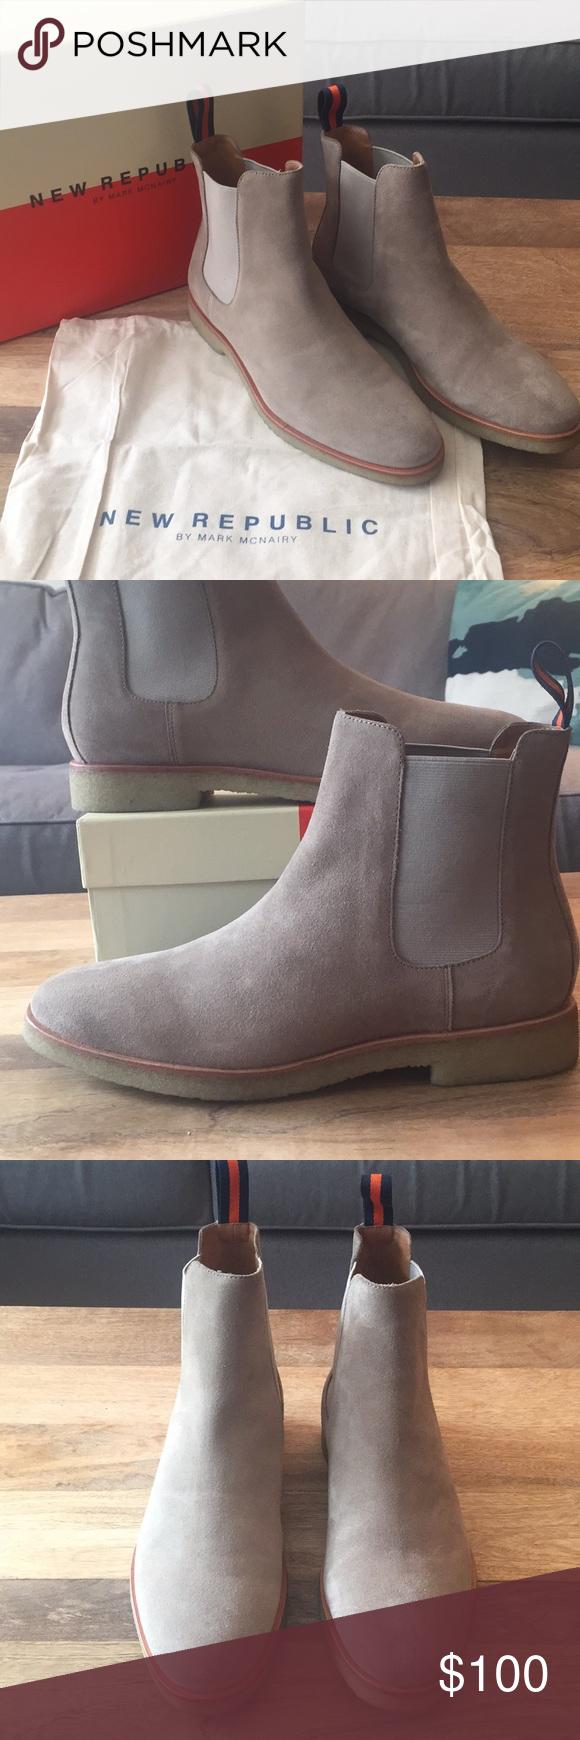 29a5386d5688f2 New Republic - Chelsea Boots - Men s Size  9.5 US BRAND NEW! New Republic